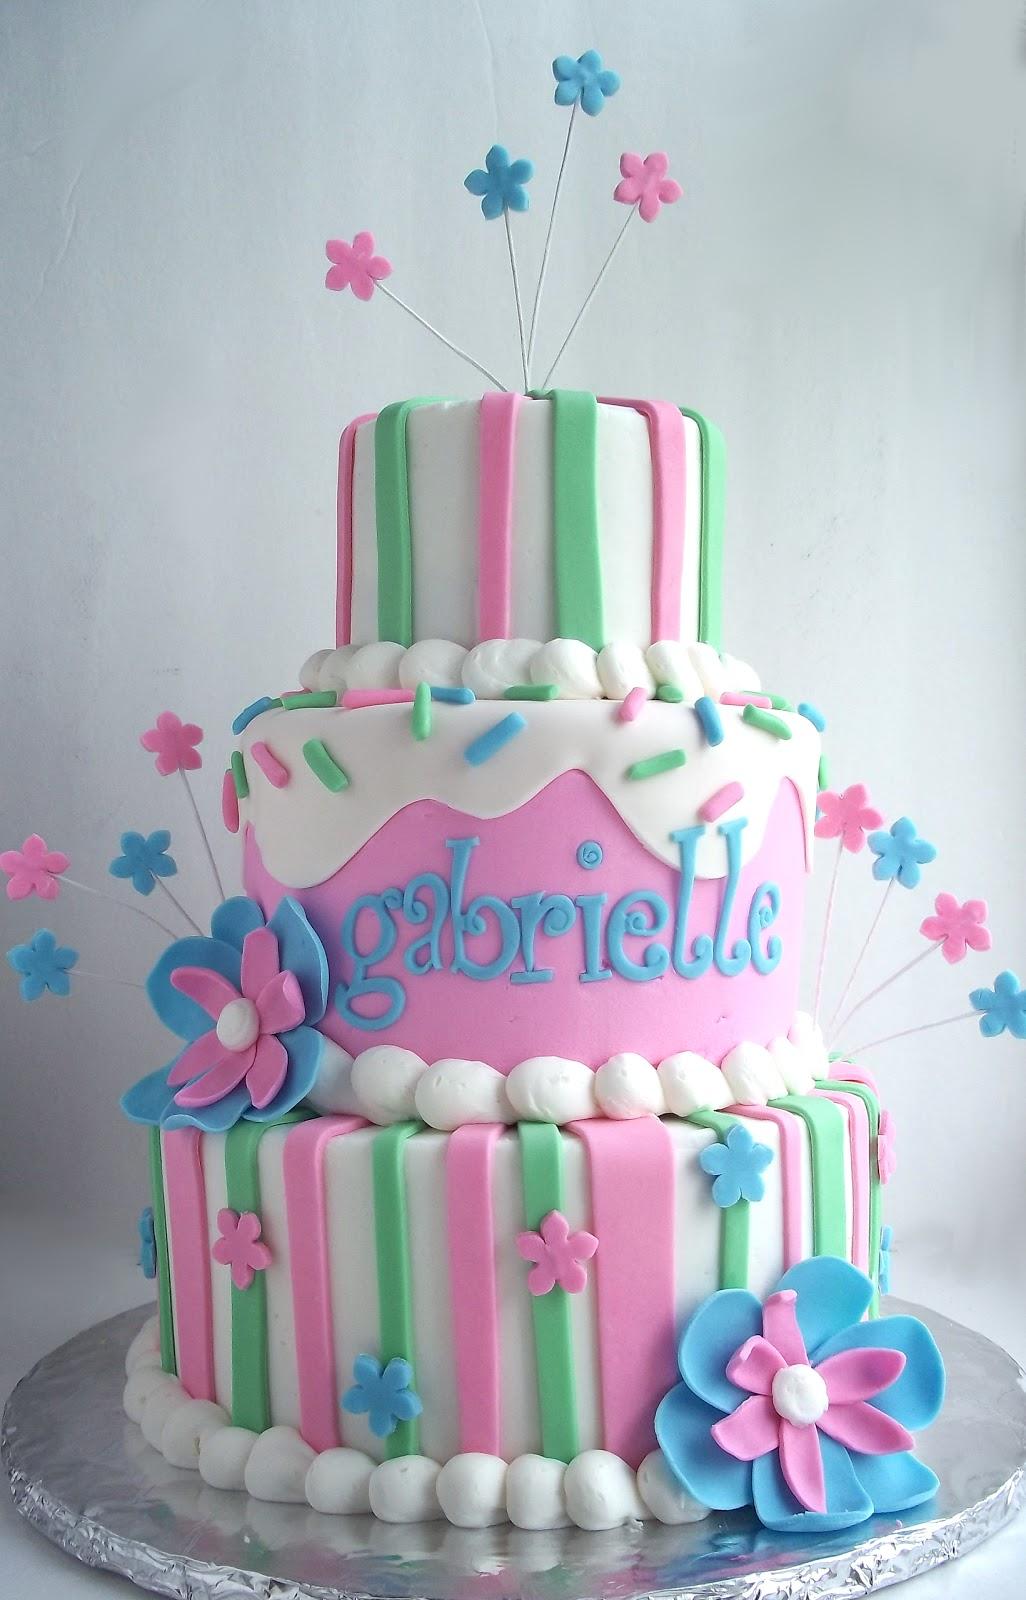 Violet S Custom Cakes Gabrielle